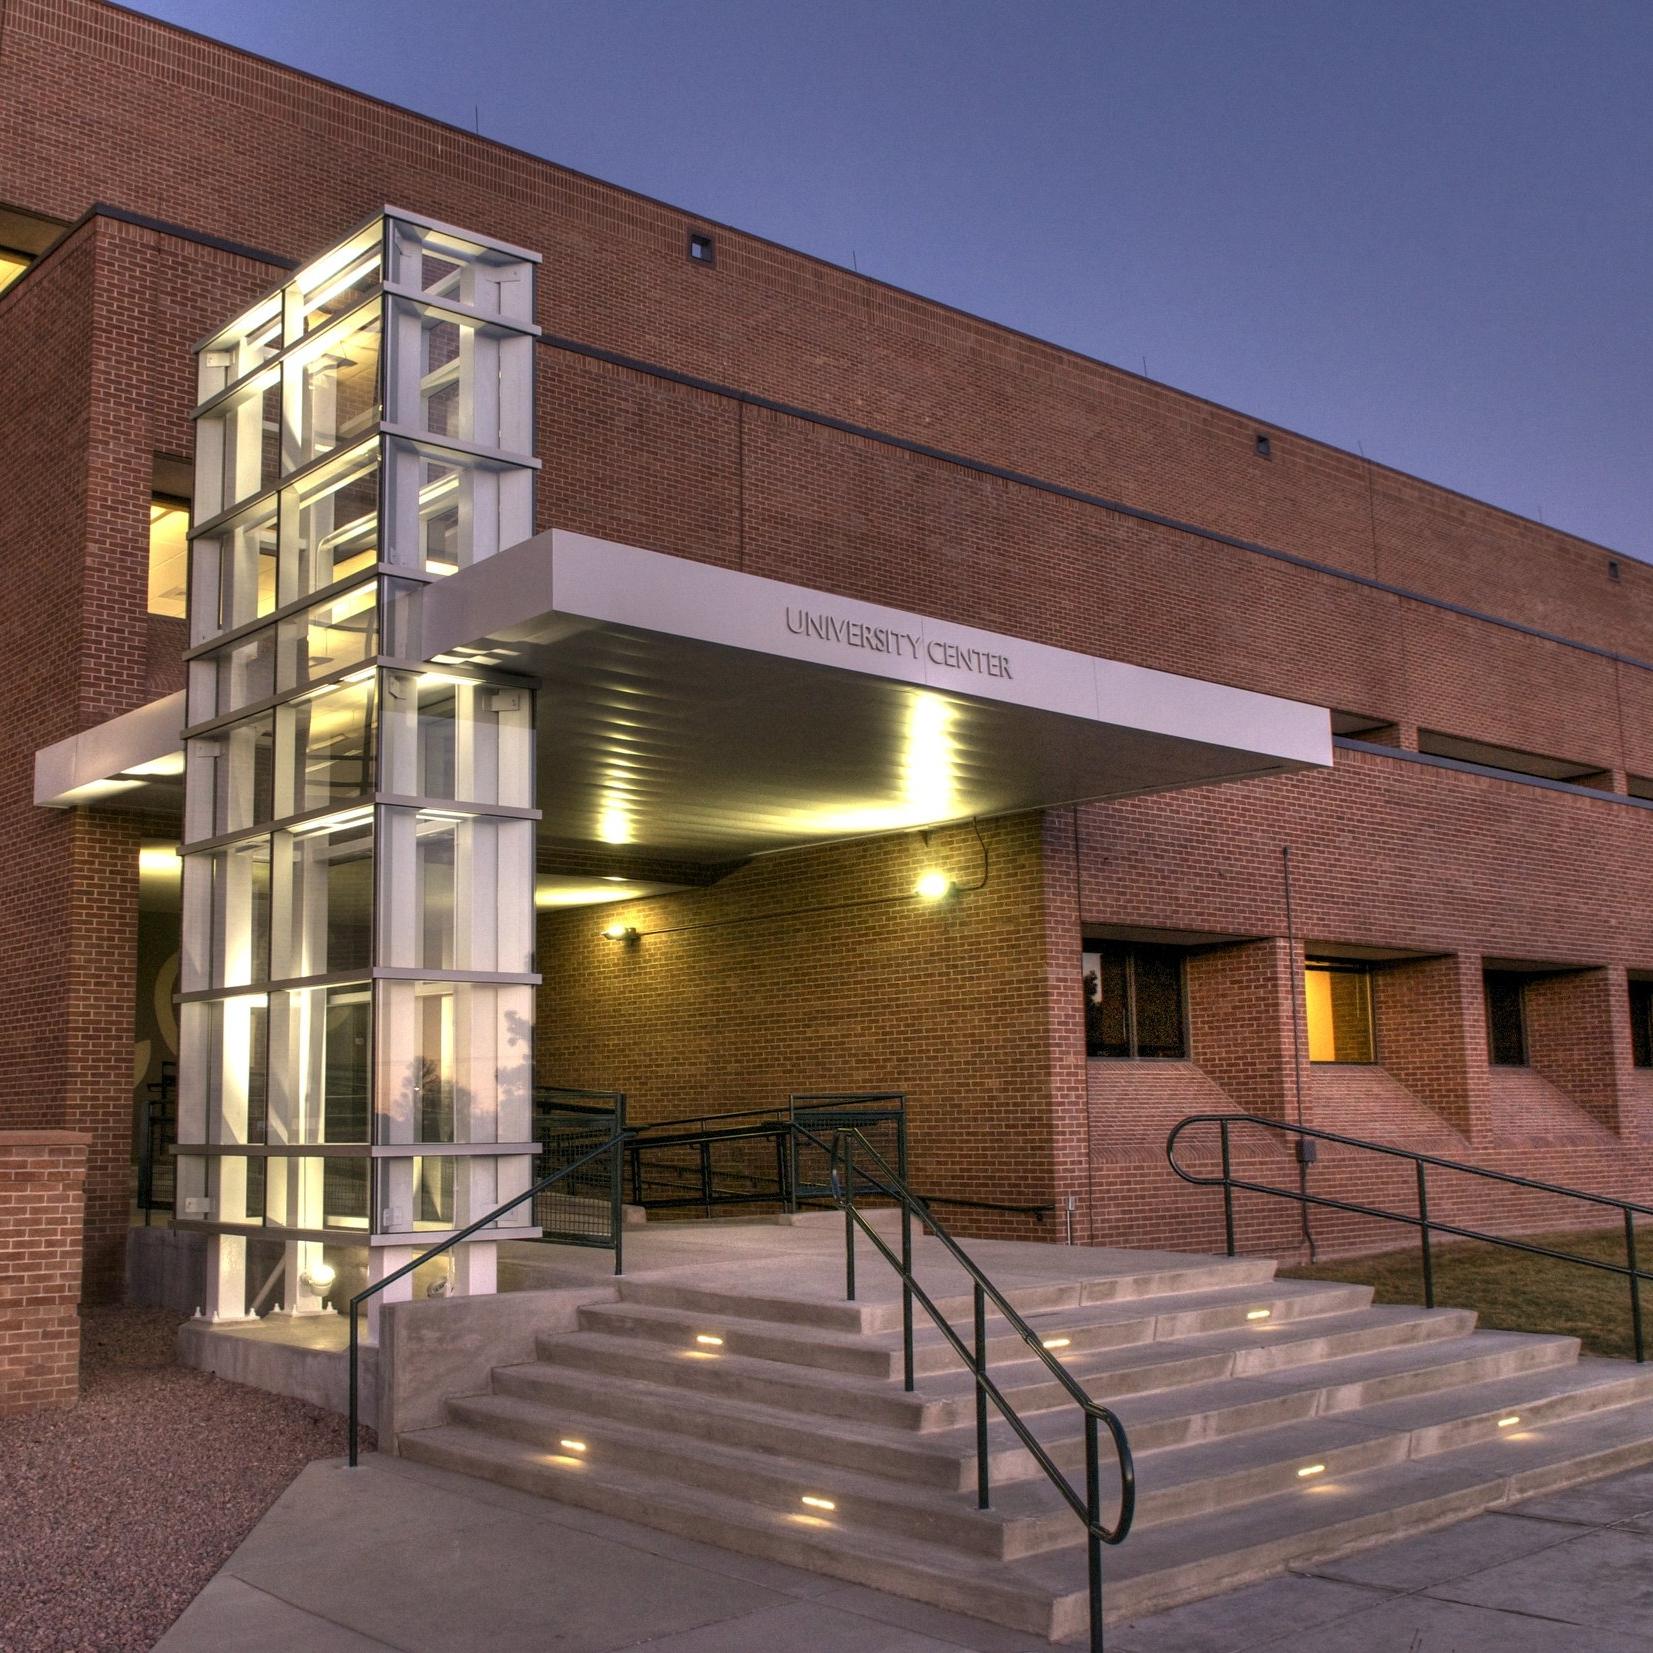 UNIVERSITY CENTER RENOVATION - University of Colorado, Colorado Springs, CO